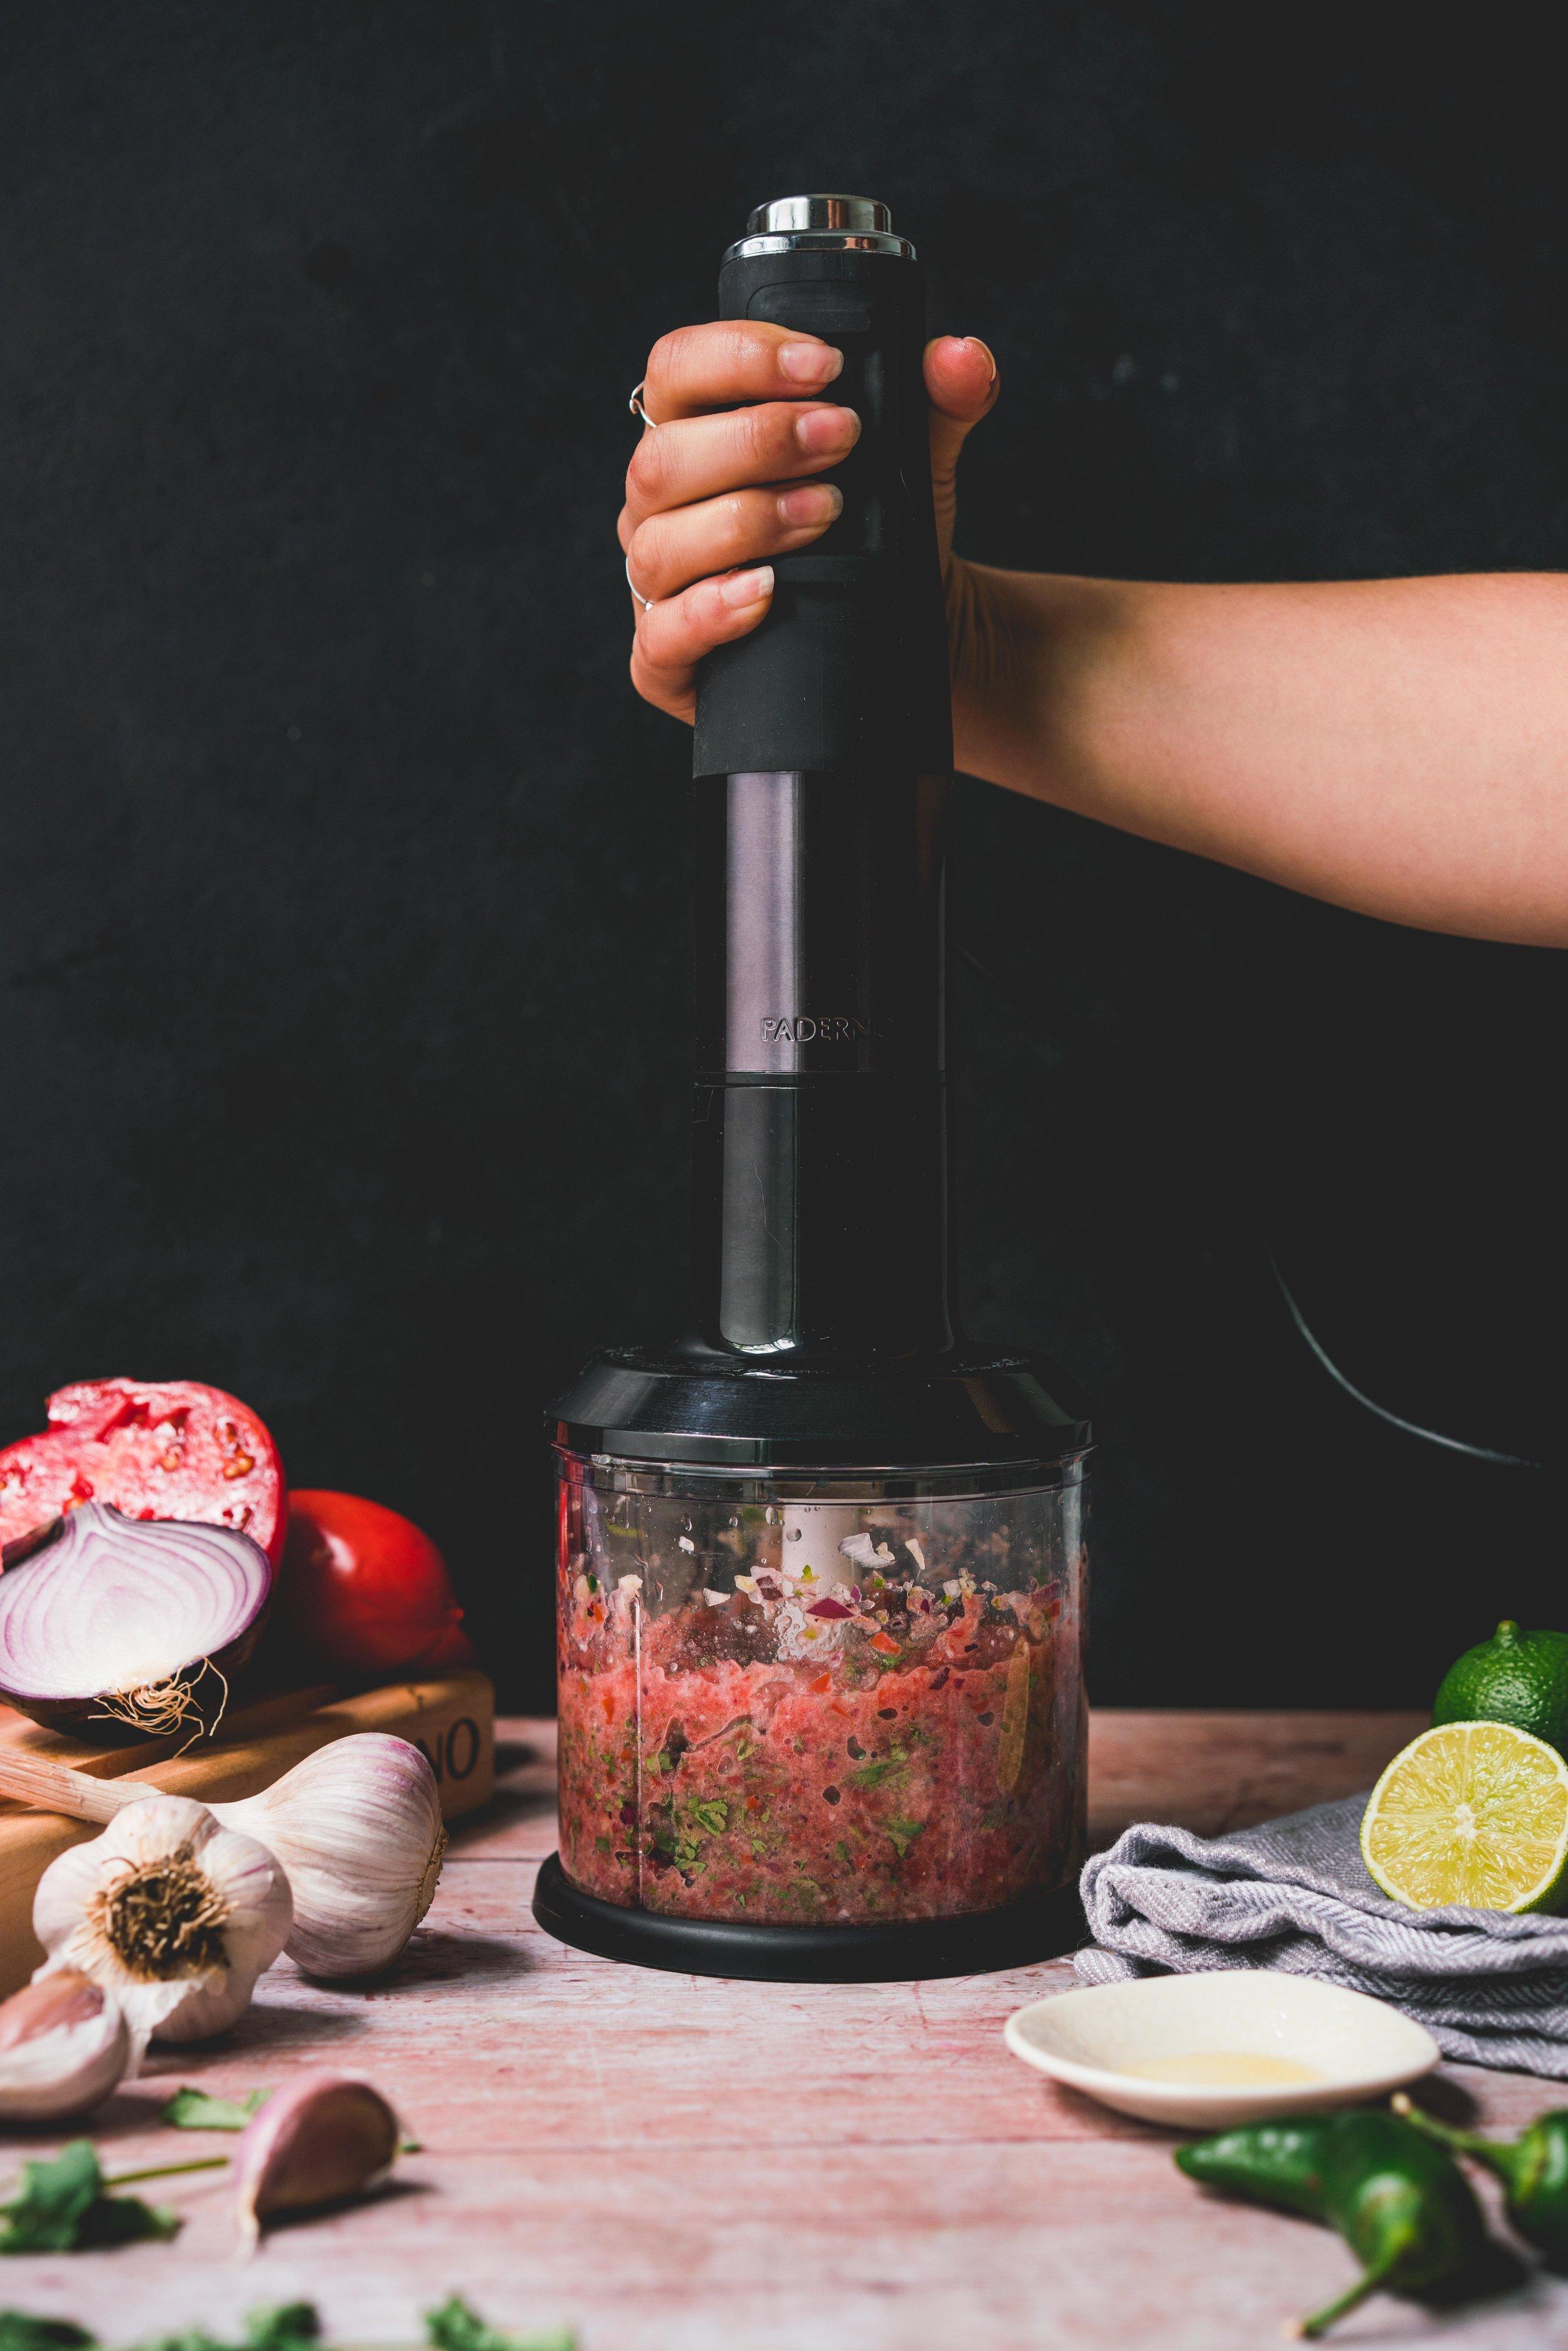 Classic salsa made using Paderno Variable Immersion Blender.